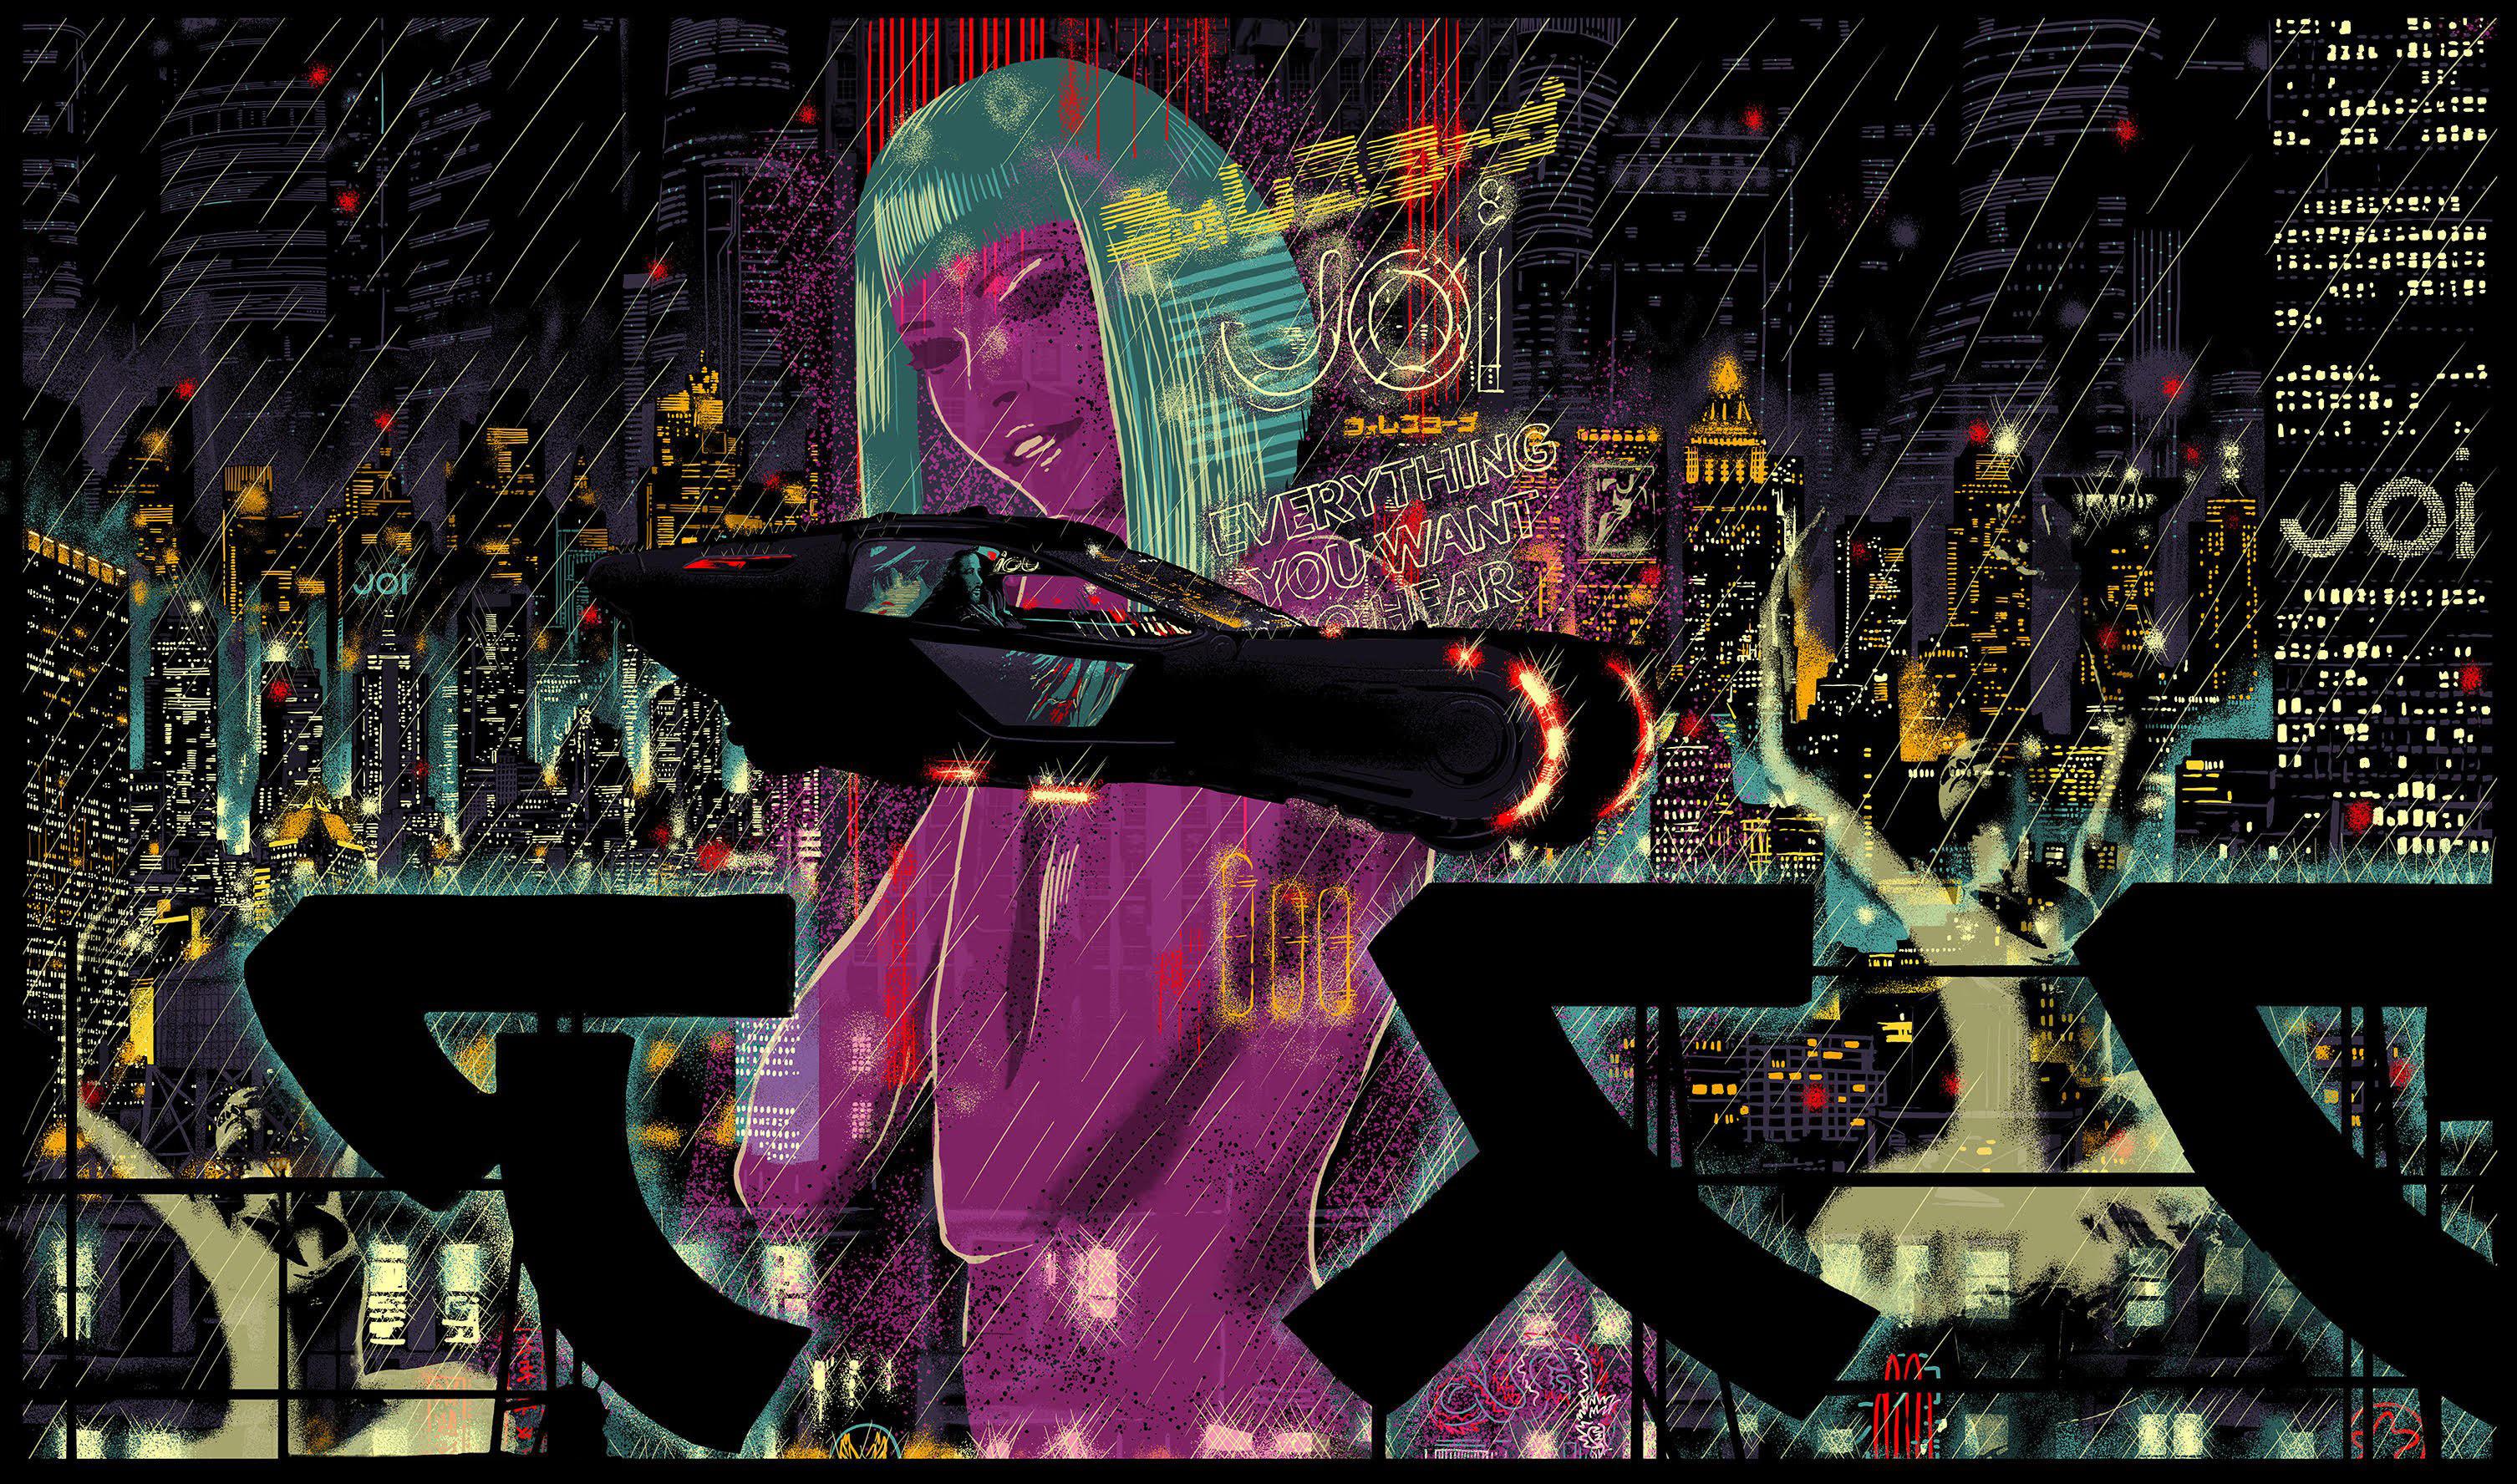 4k Blade Runner 2049, HD Movies, 4k Wallpapers, Images ...